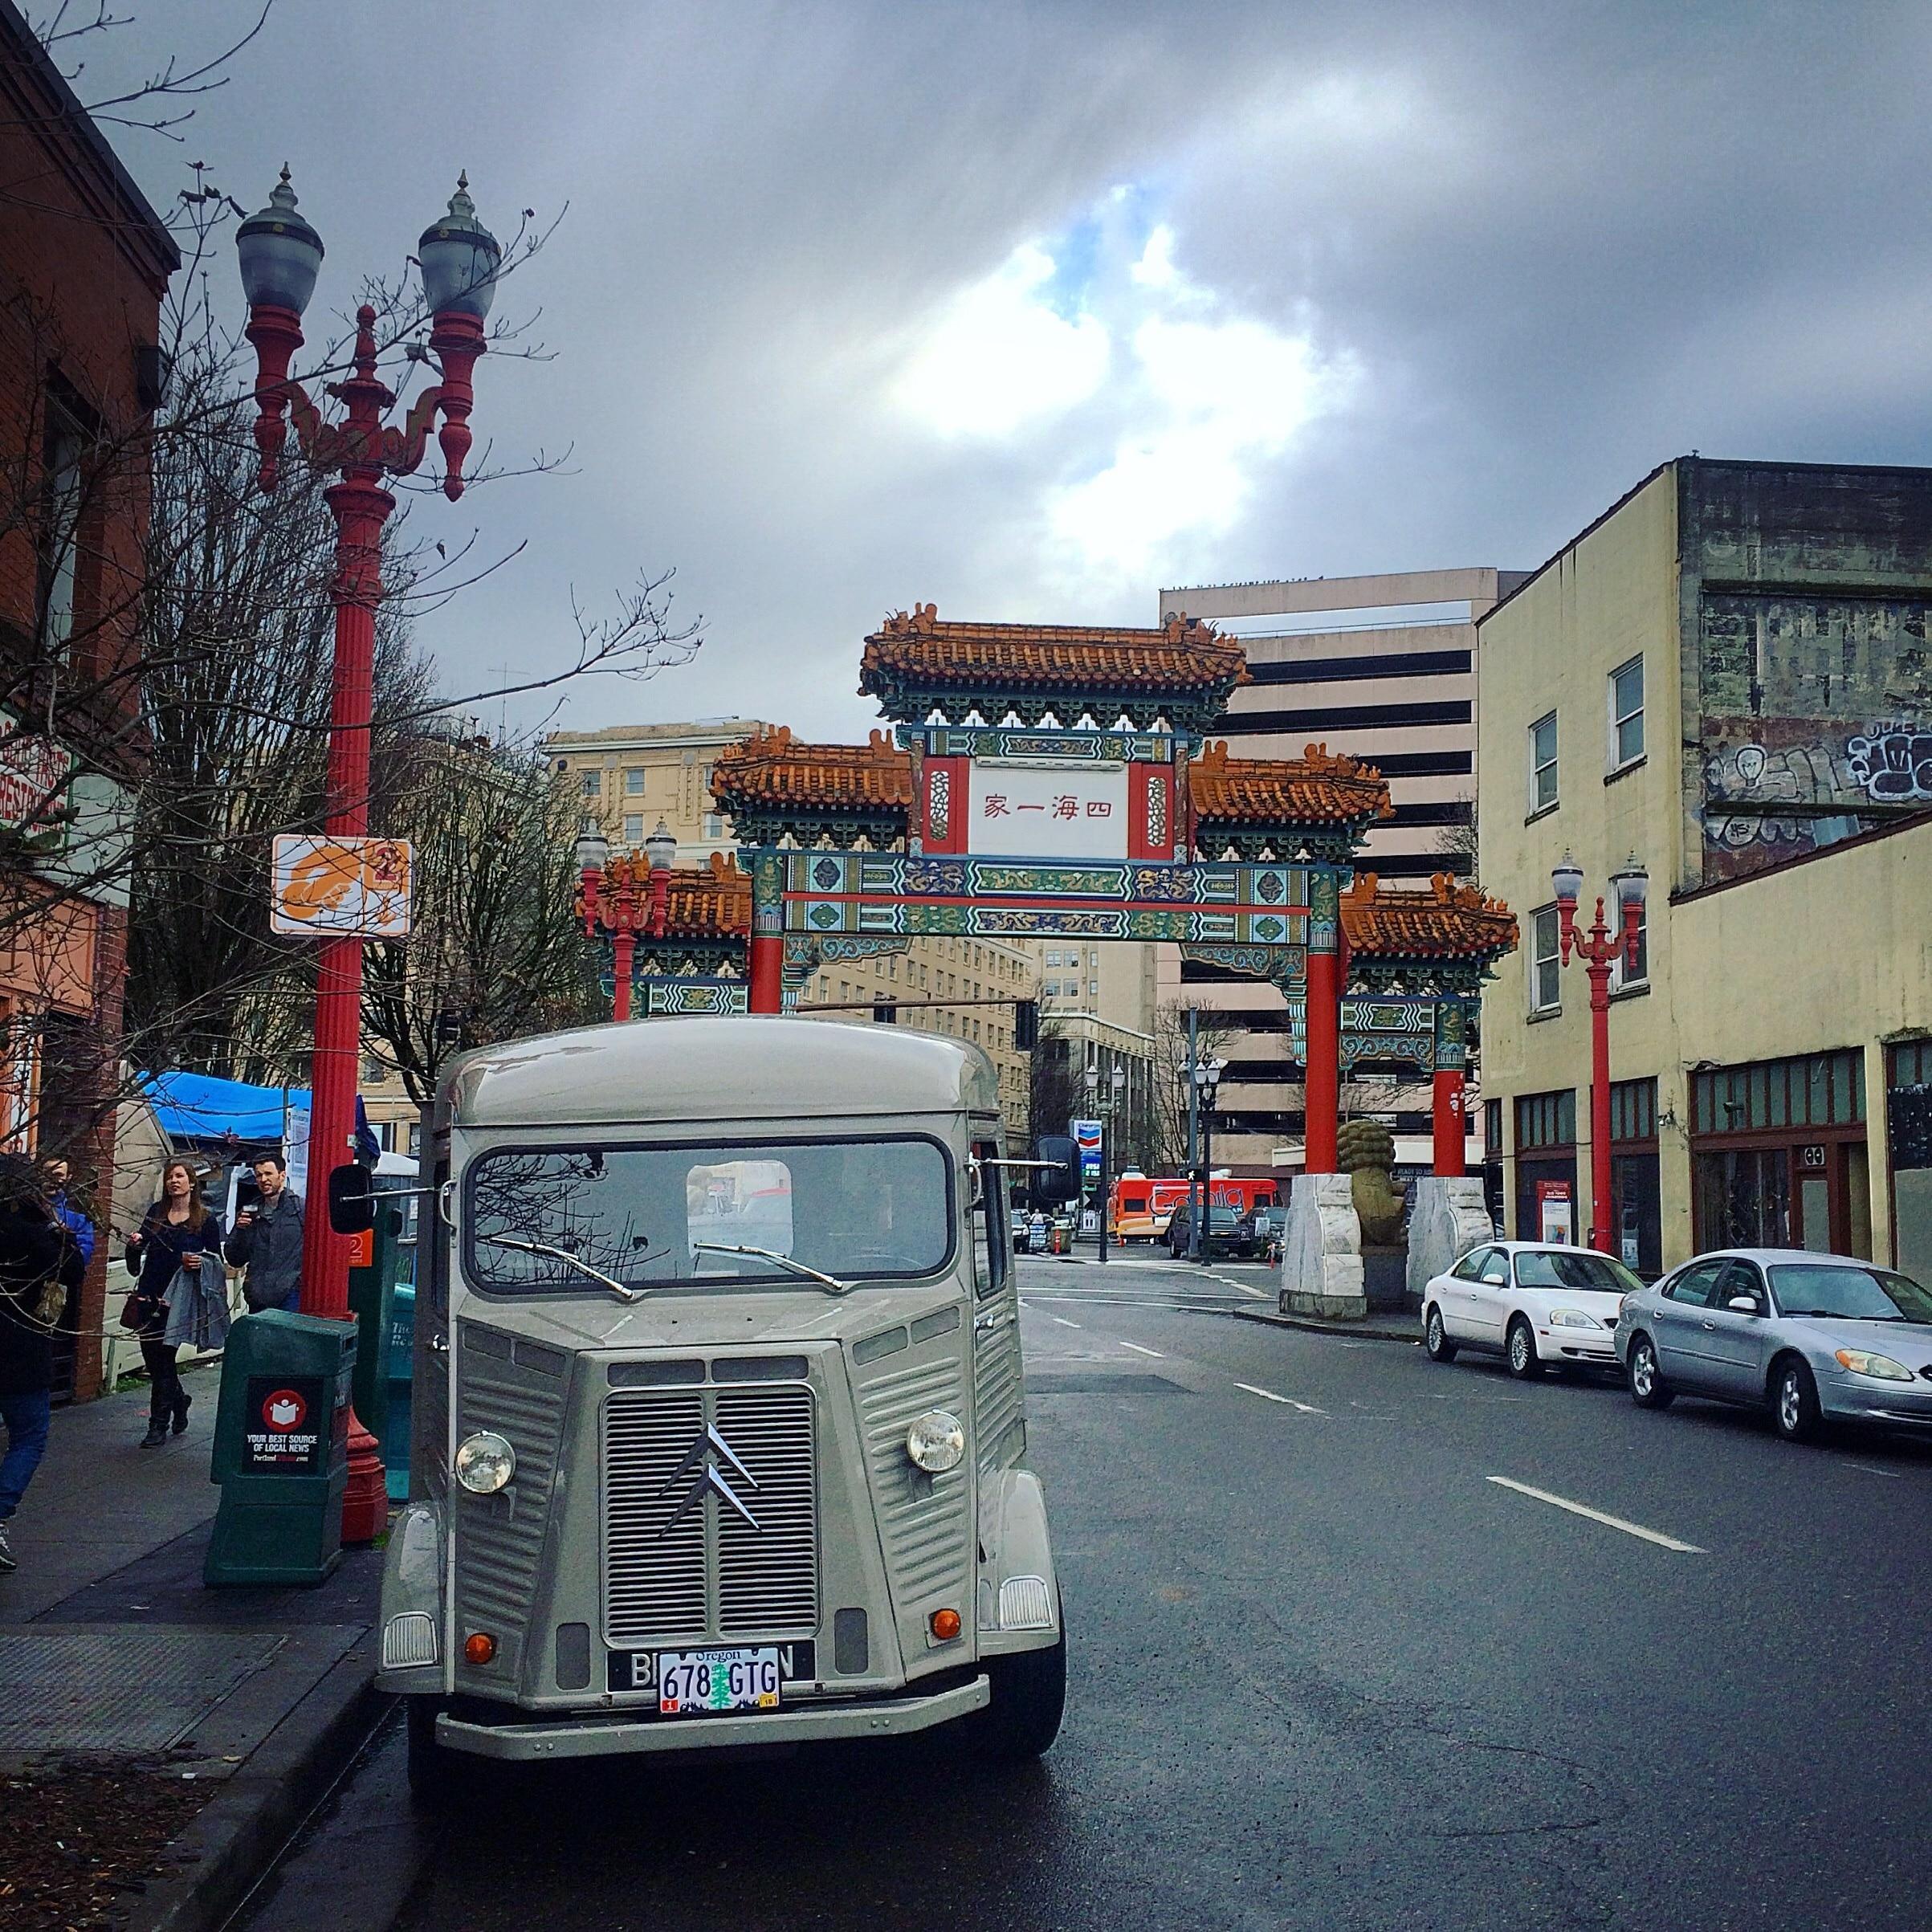 Chinatown Gate, Portland, Oregon, USA